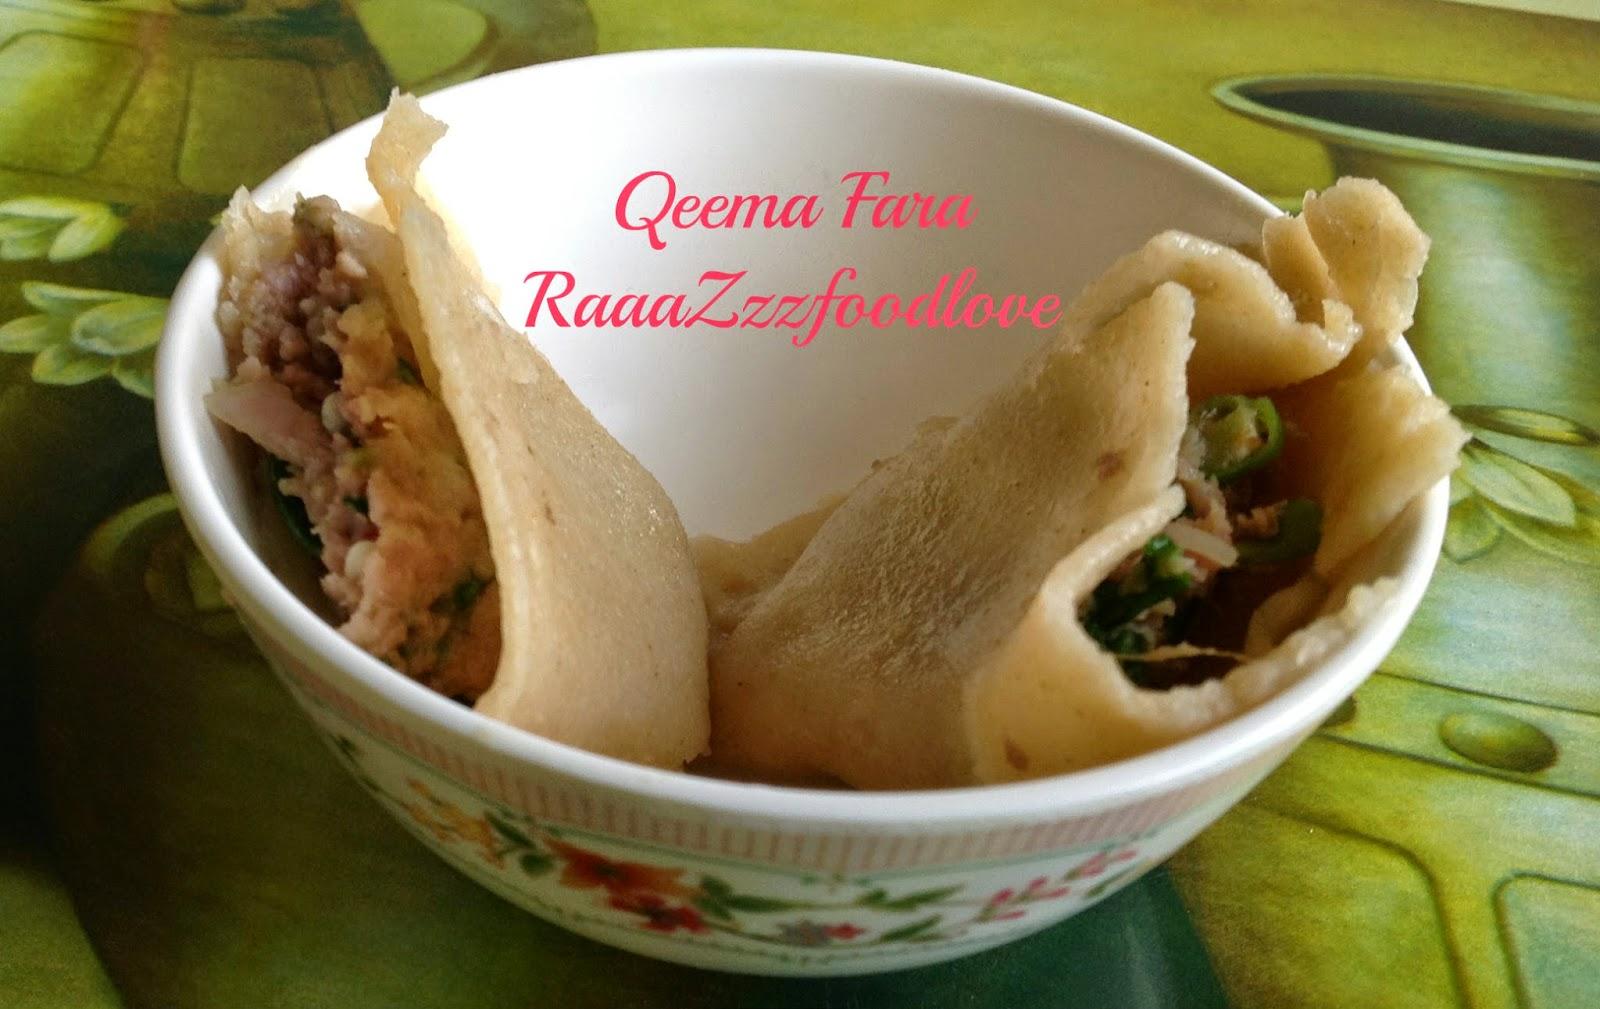 http://raaazzzfoodlove.blogspot.in/2013/09/qeema-fara.html